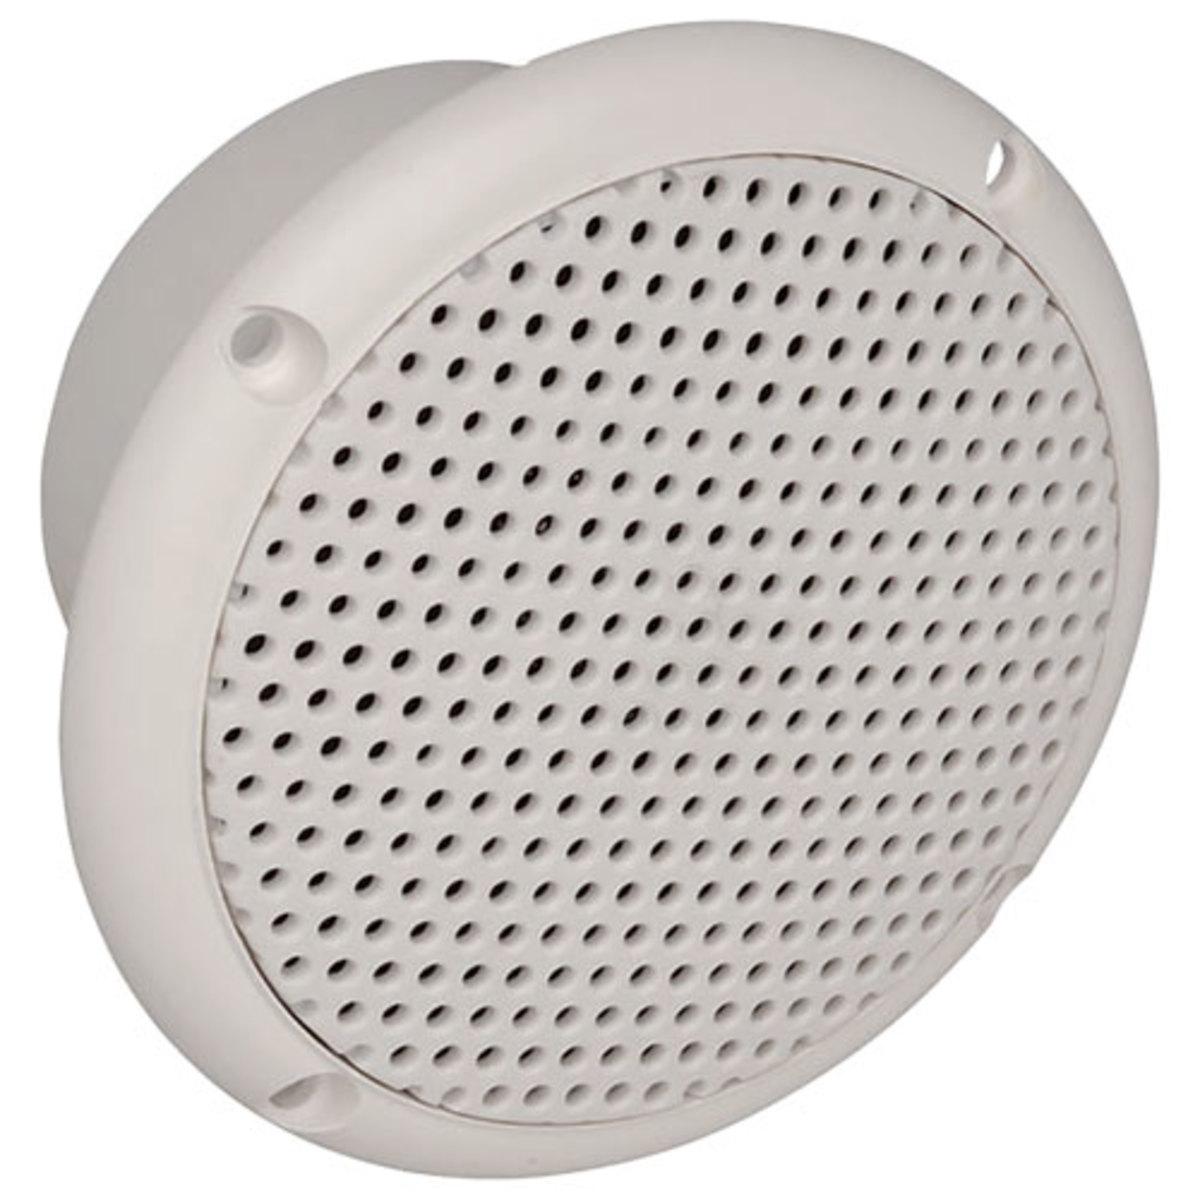 Cockpit-speaker